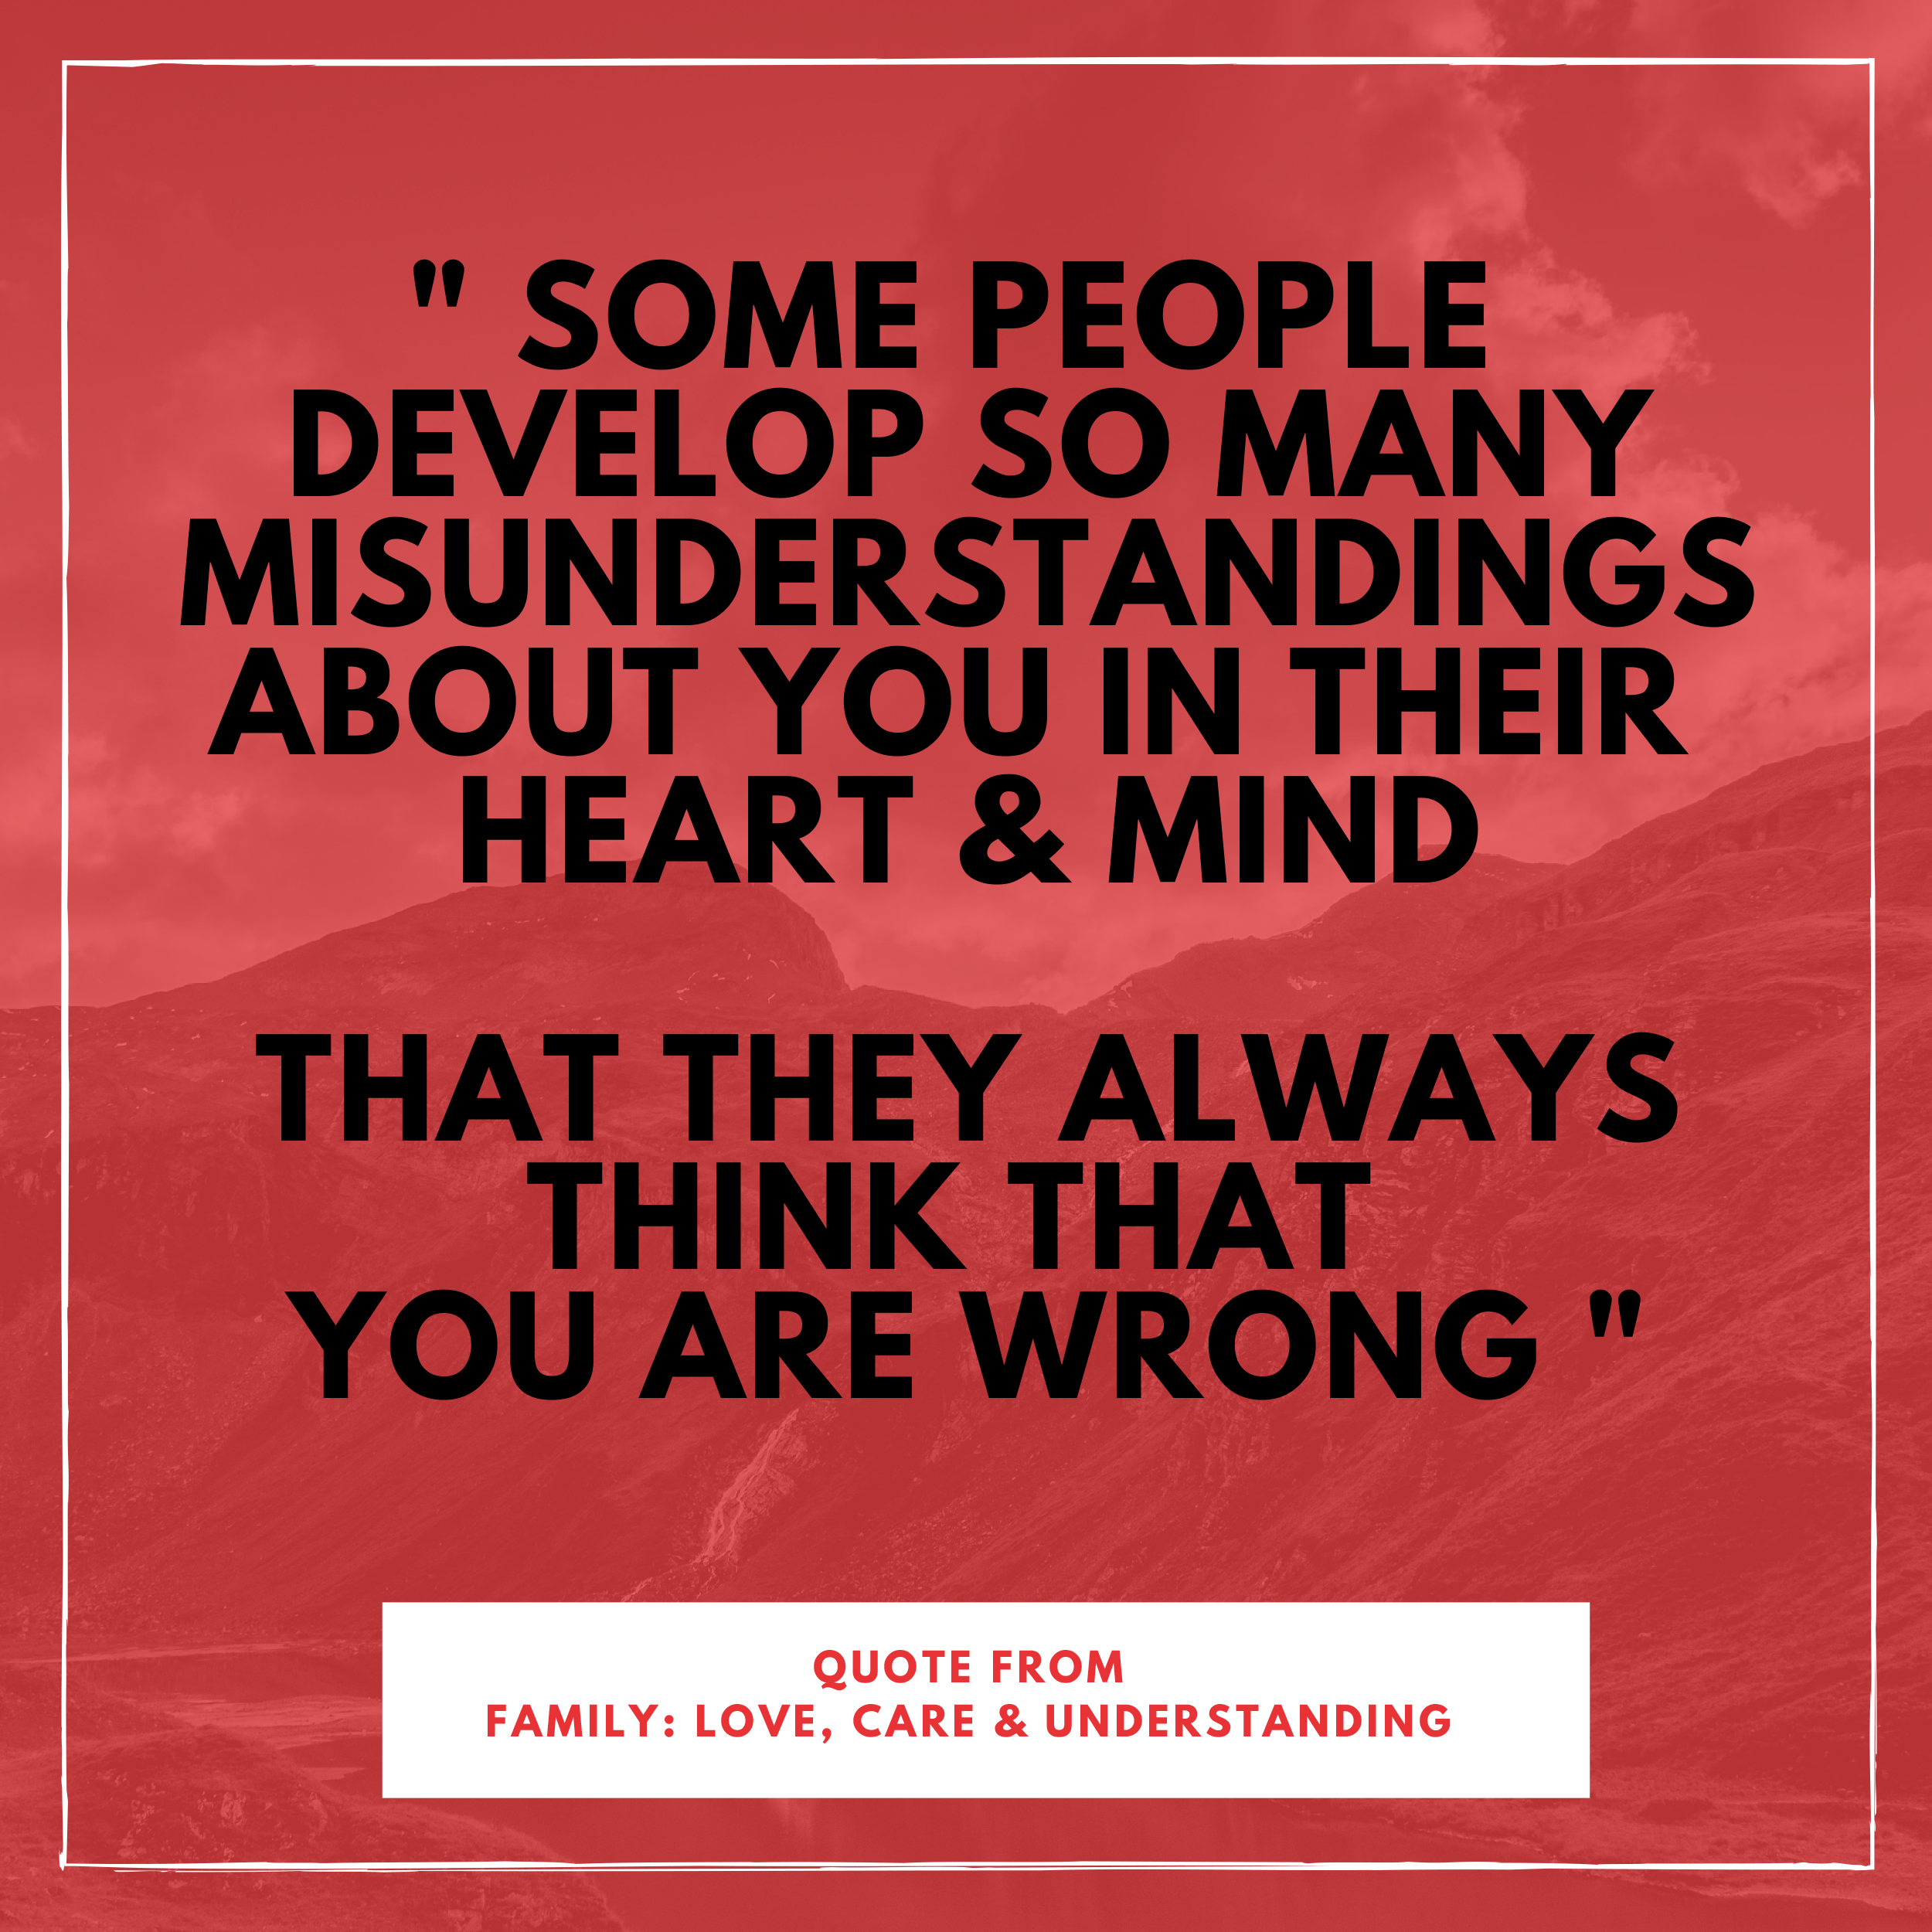 Misunderstanding Quote Family Love Care Understanding Misunderstood Quotes Family Quotes Life Quotes